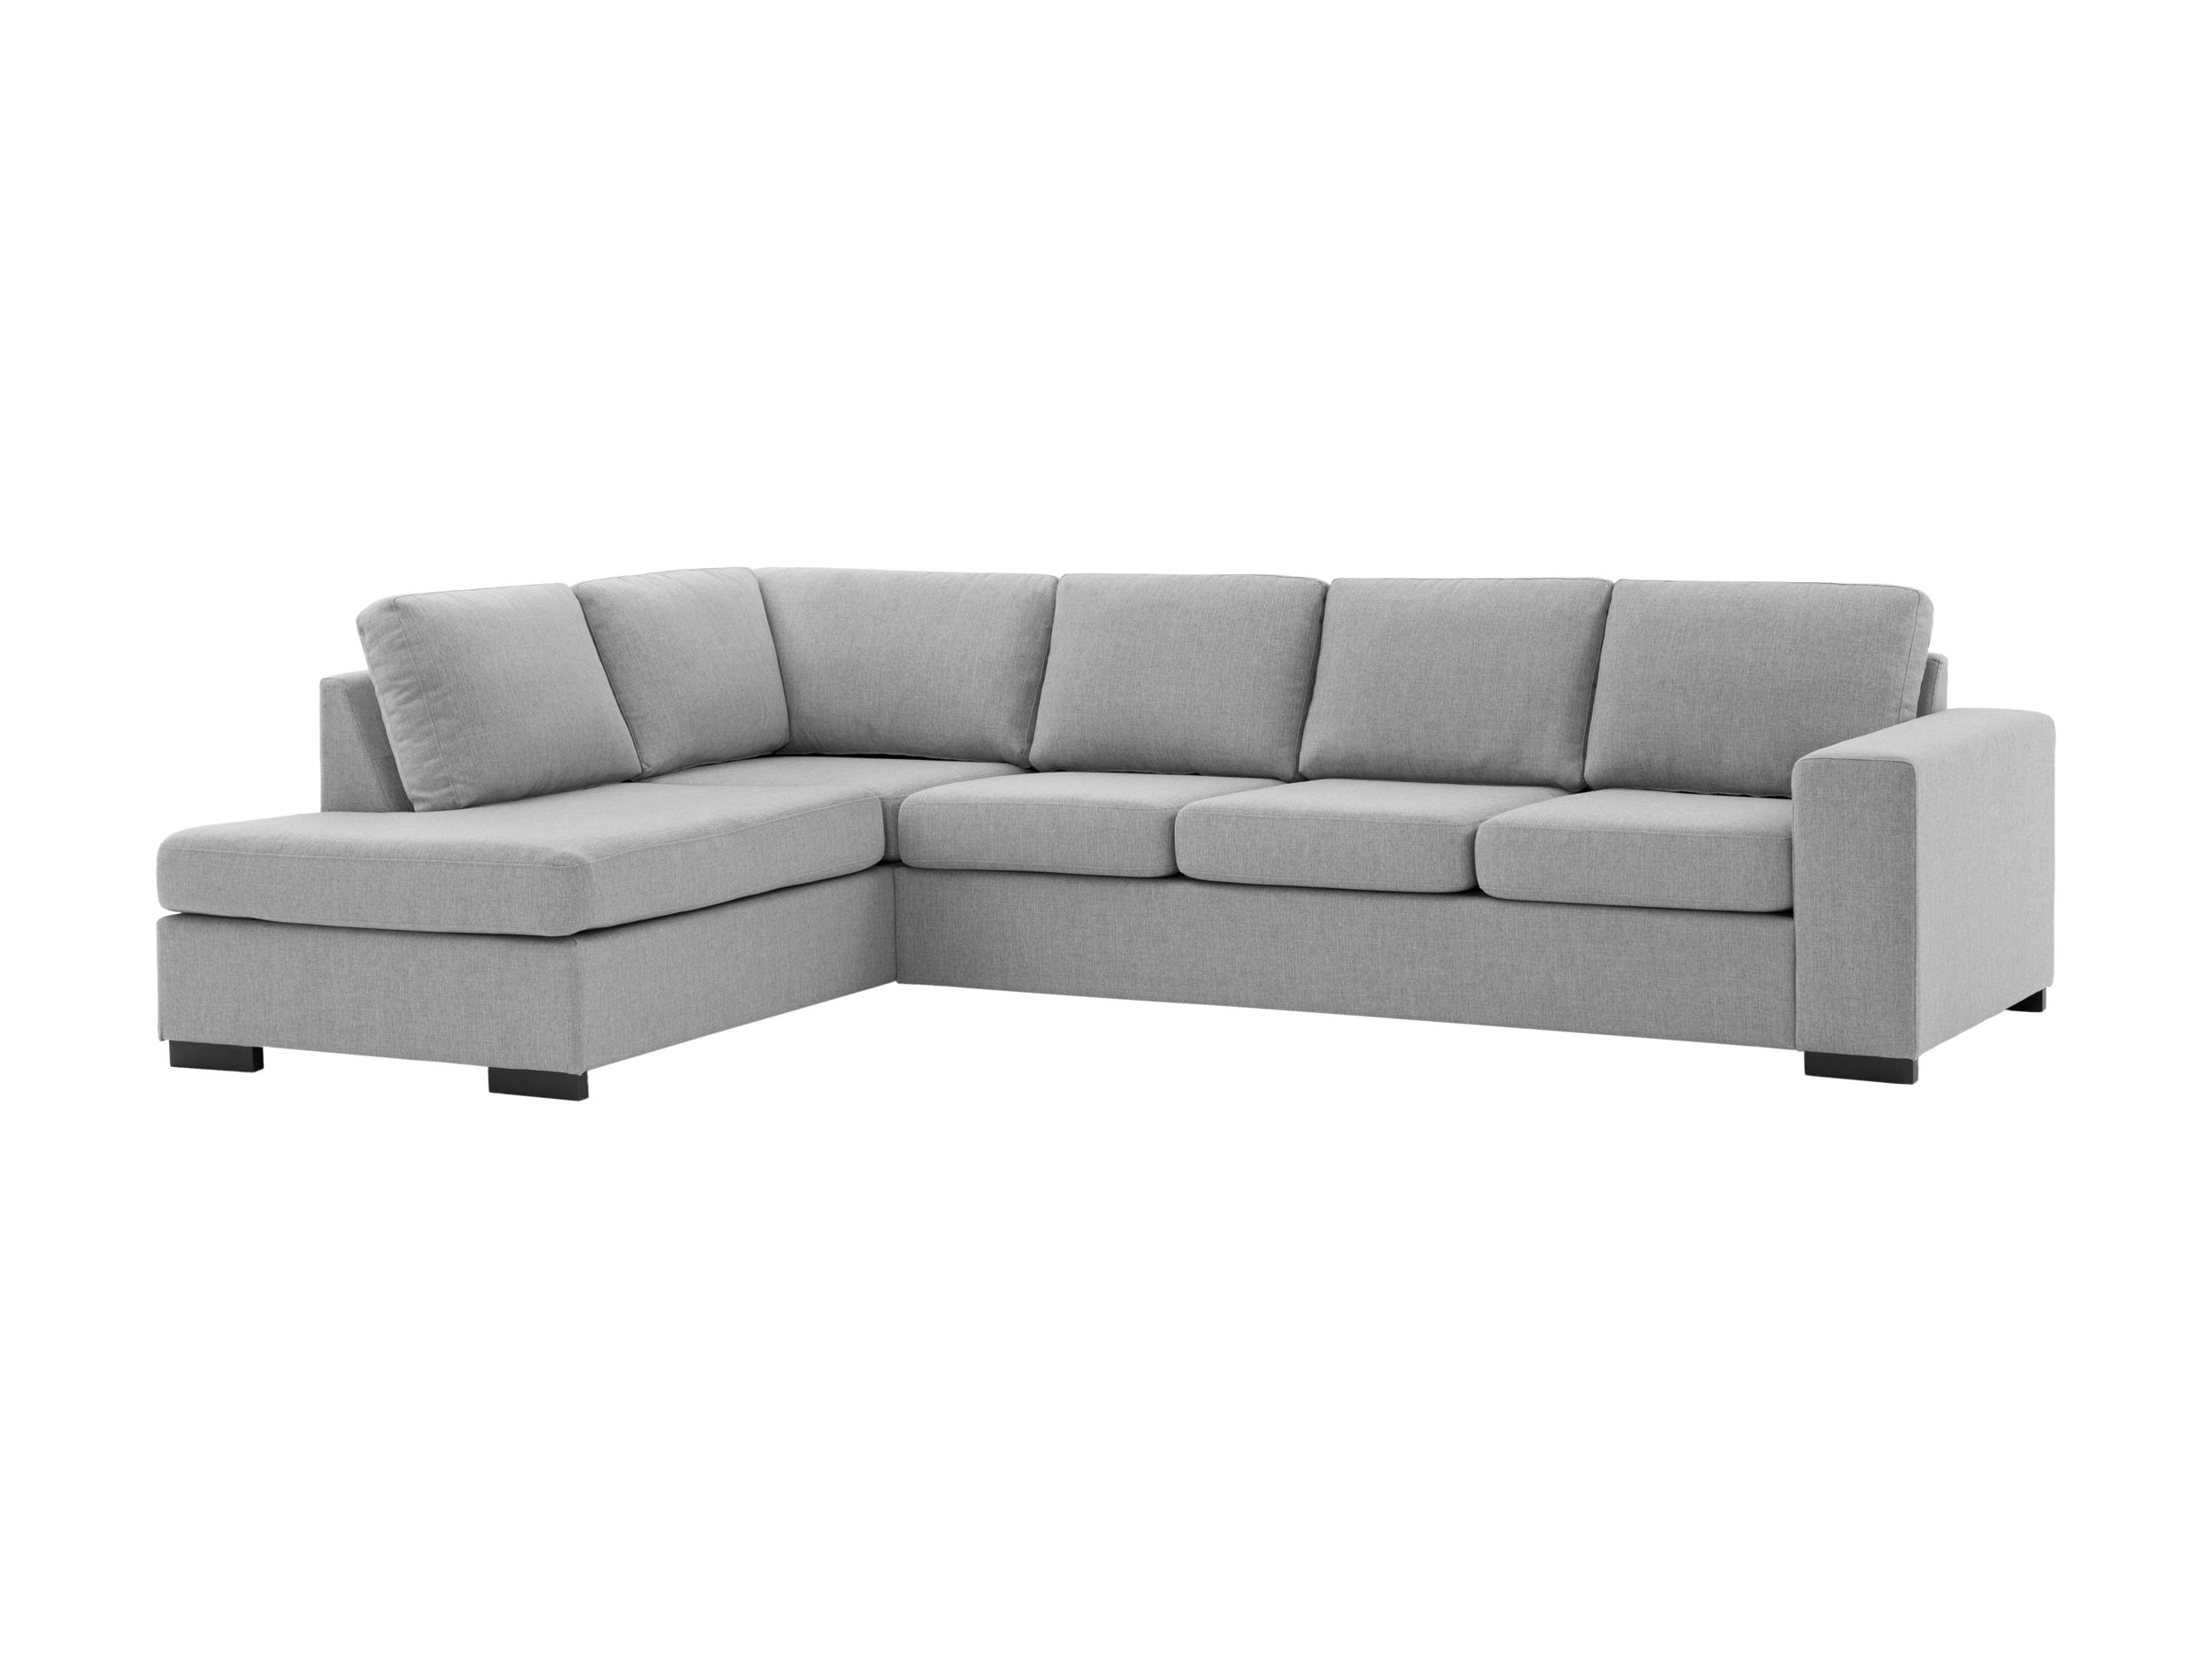 New York Large L Sofa Hellgrau Ecksofas Sofas Fur Den Inn Sectional Couch Couch L Sofas